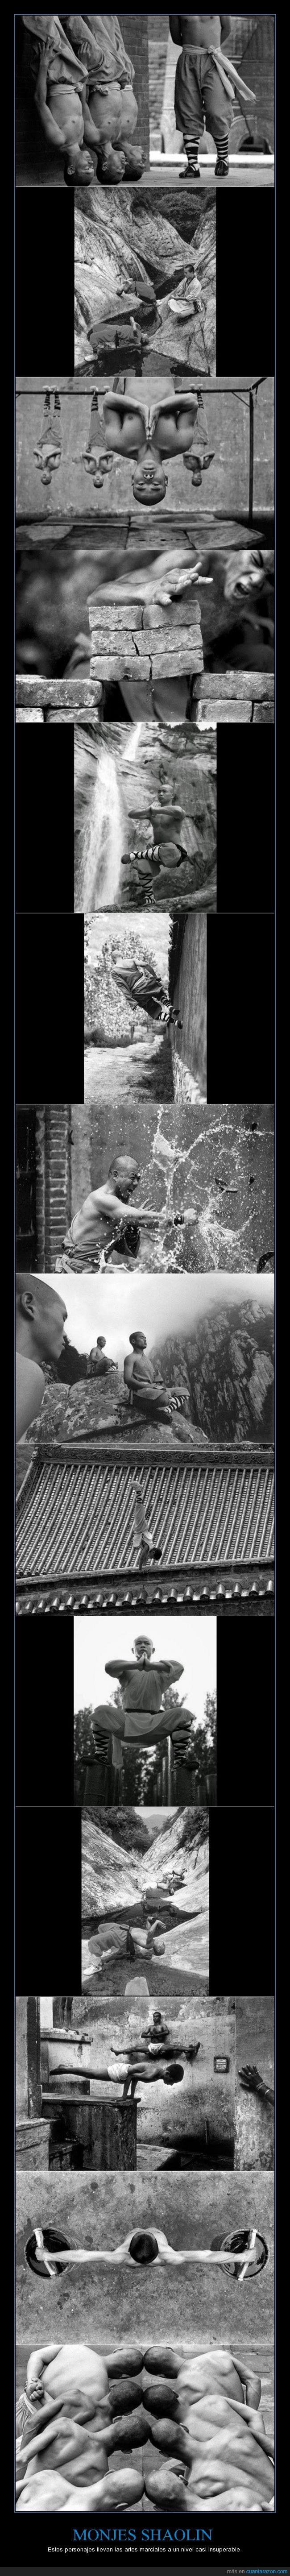 artes marciales,autodefensa,casi insuperable,equilibrio,fuerza,impresionante,monjes shaolin